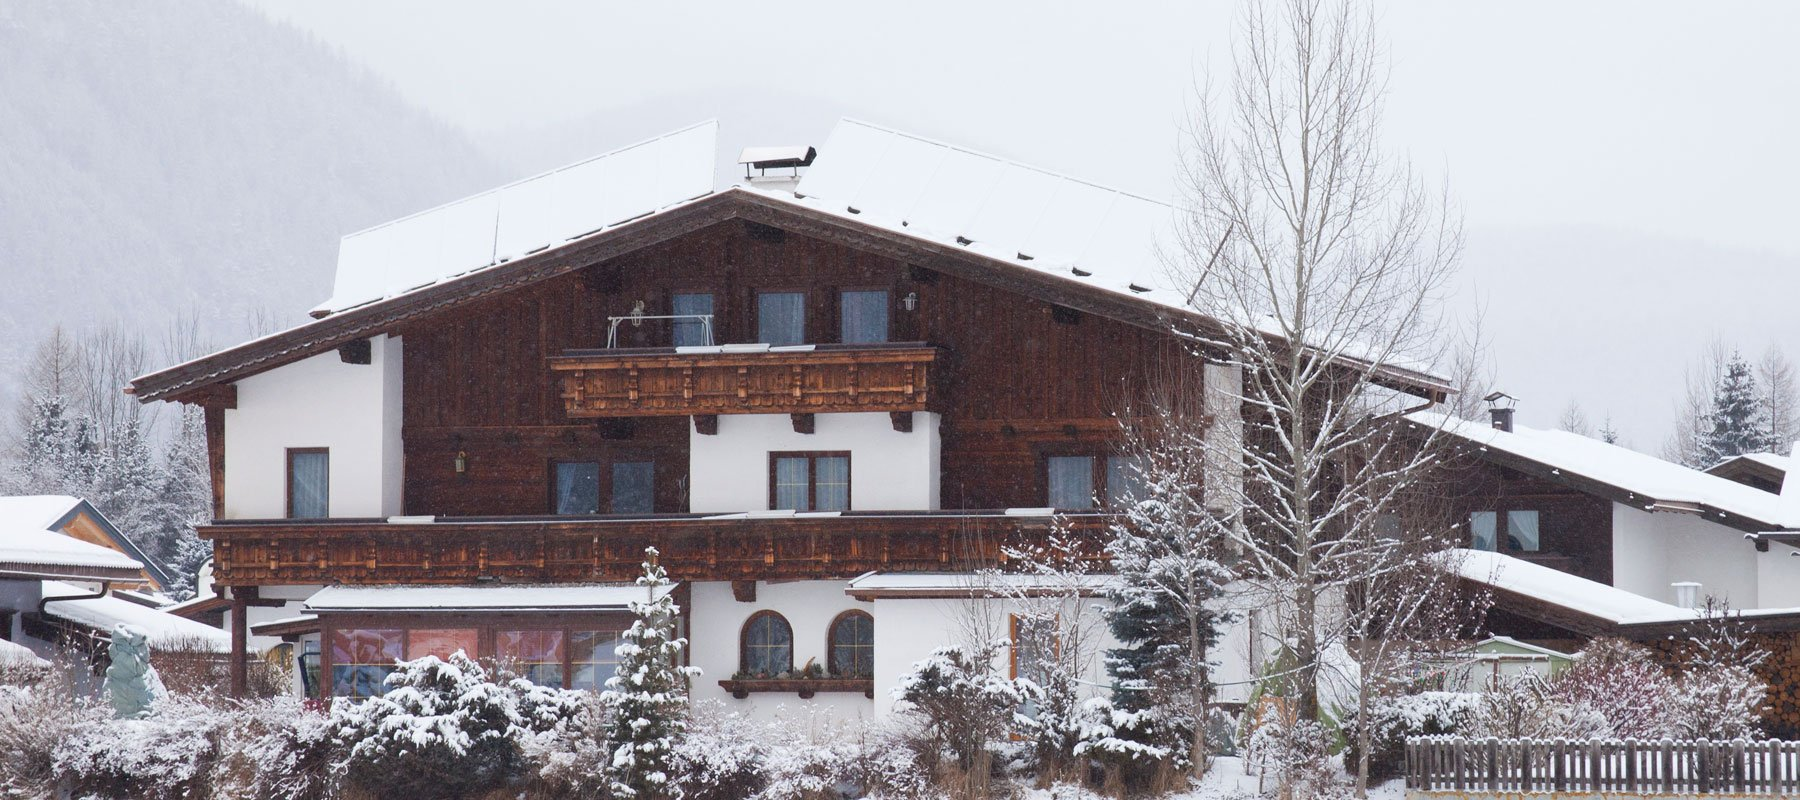 Ferienhaus Alpenroyal im Winter